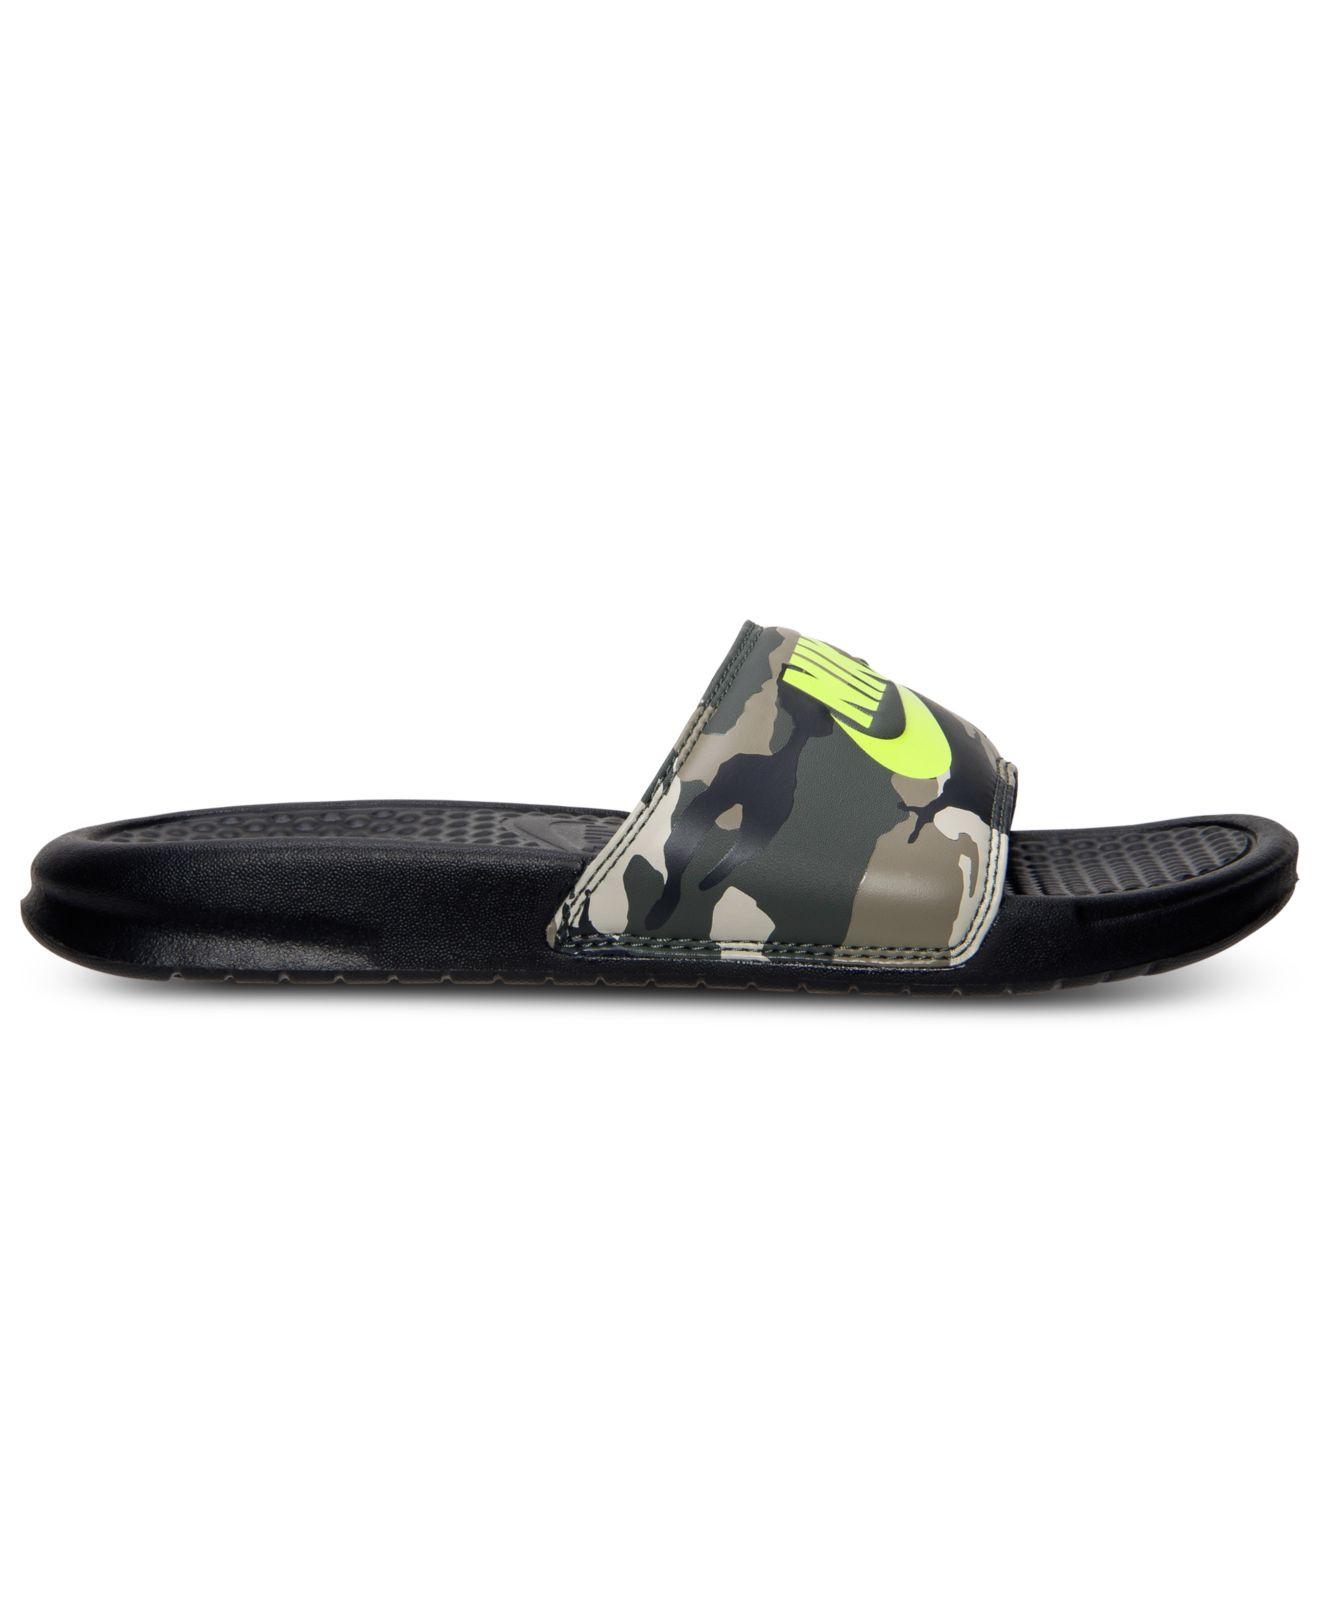 5a8ad502e65f Lyst - Nike Men S Benassi Jdi Print Slide Sandals From Finish Line ...